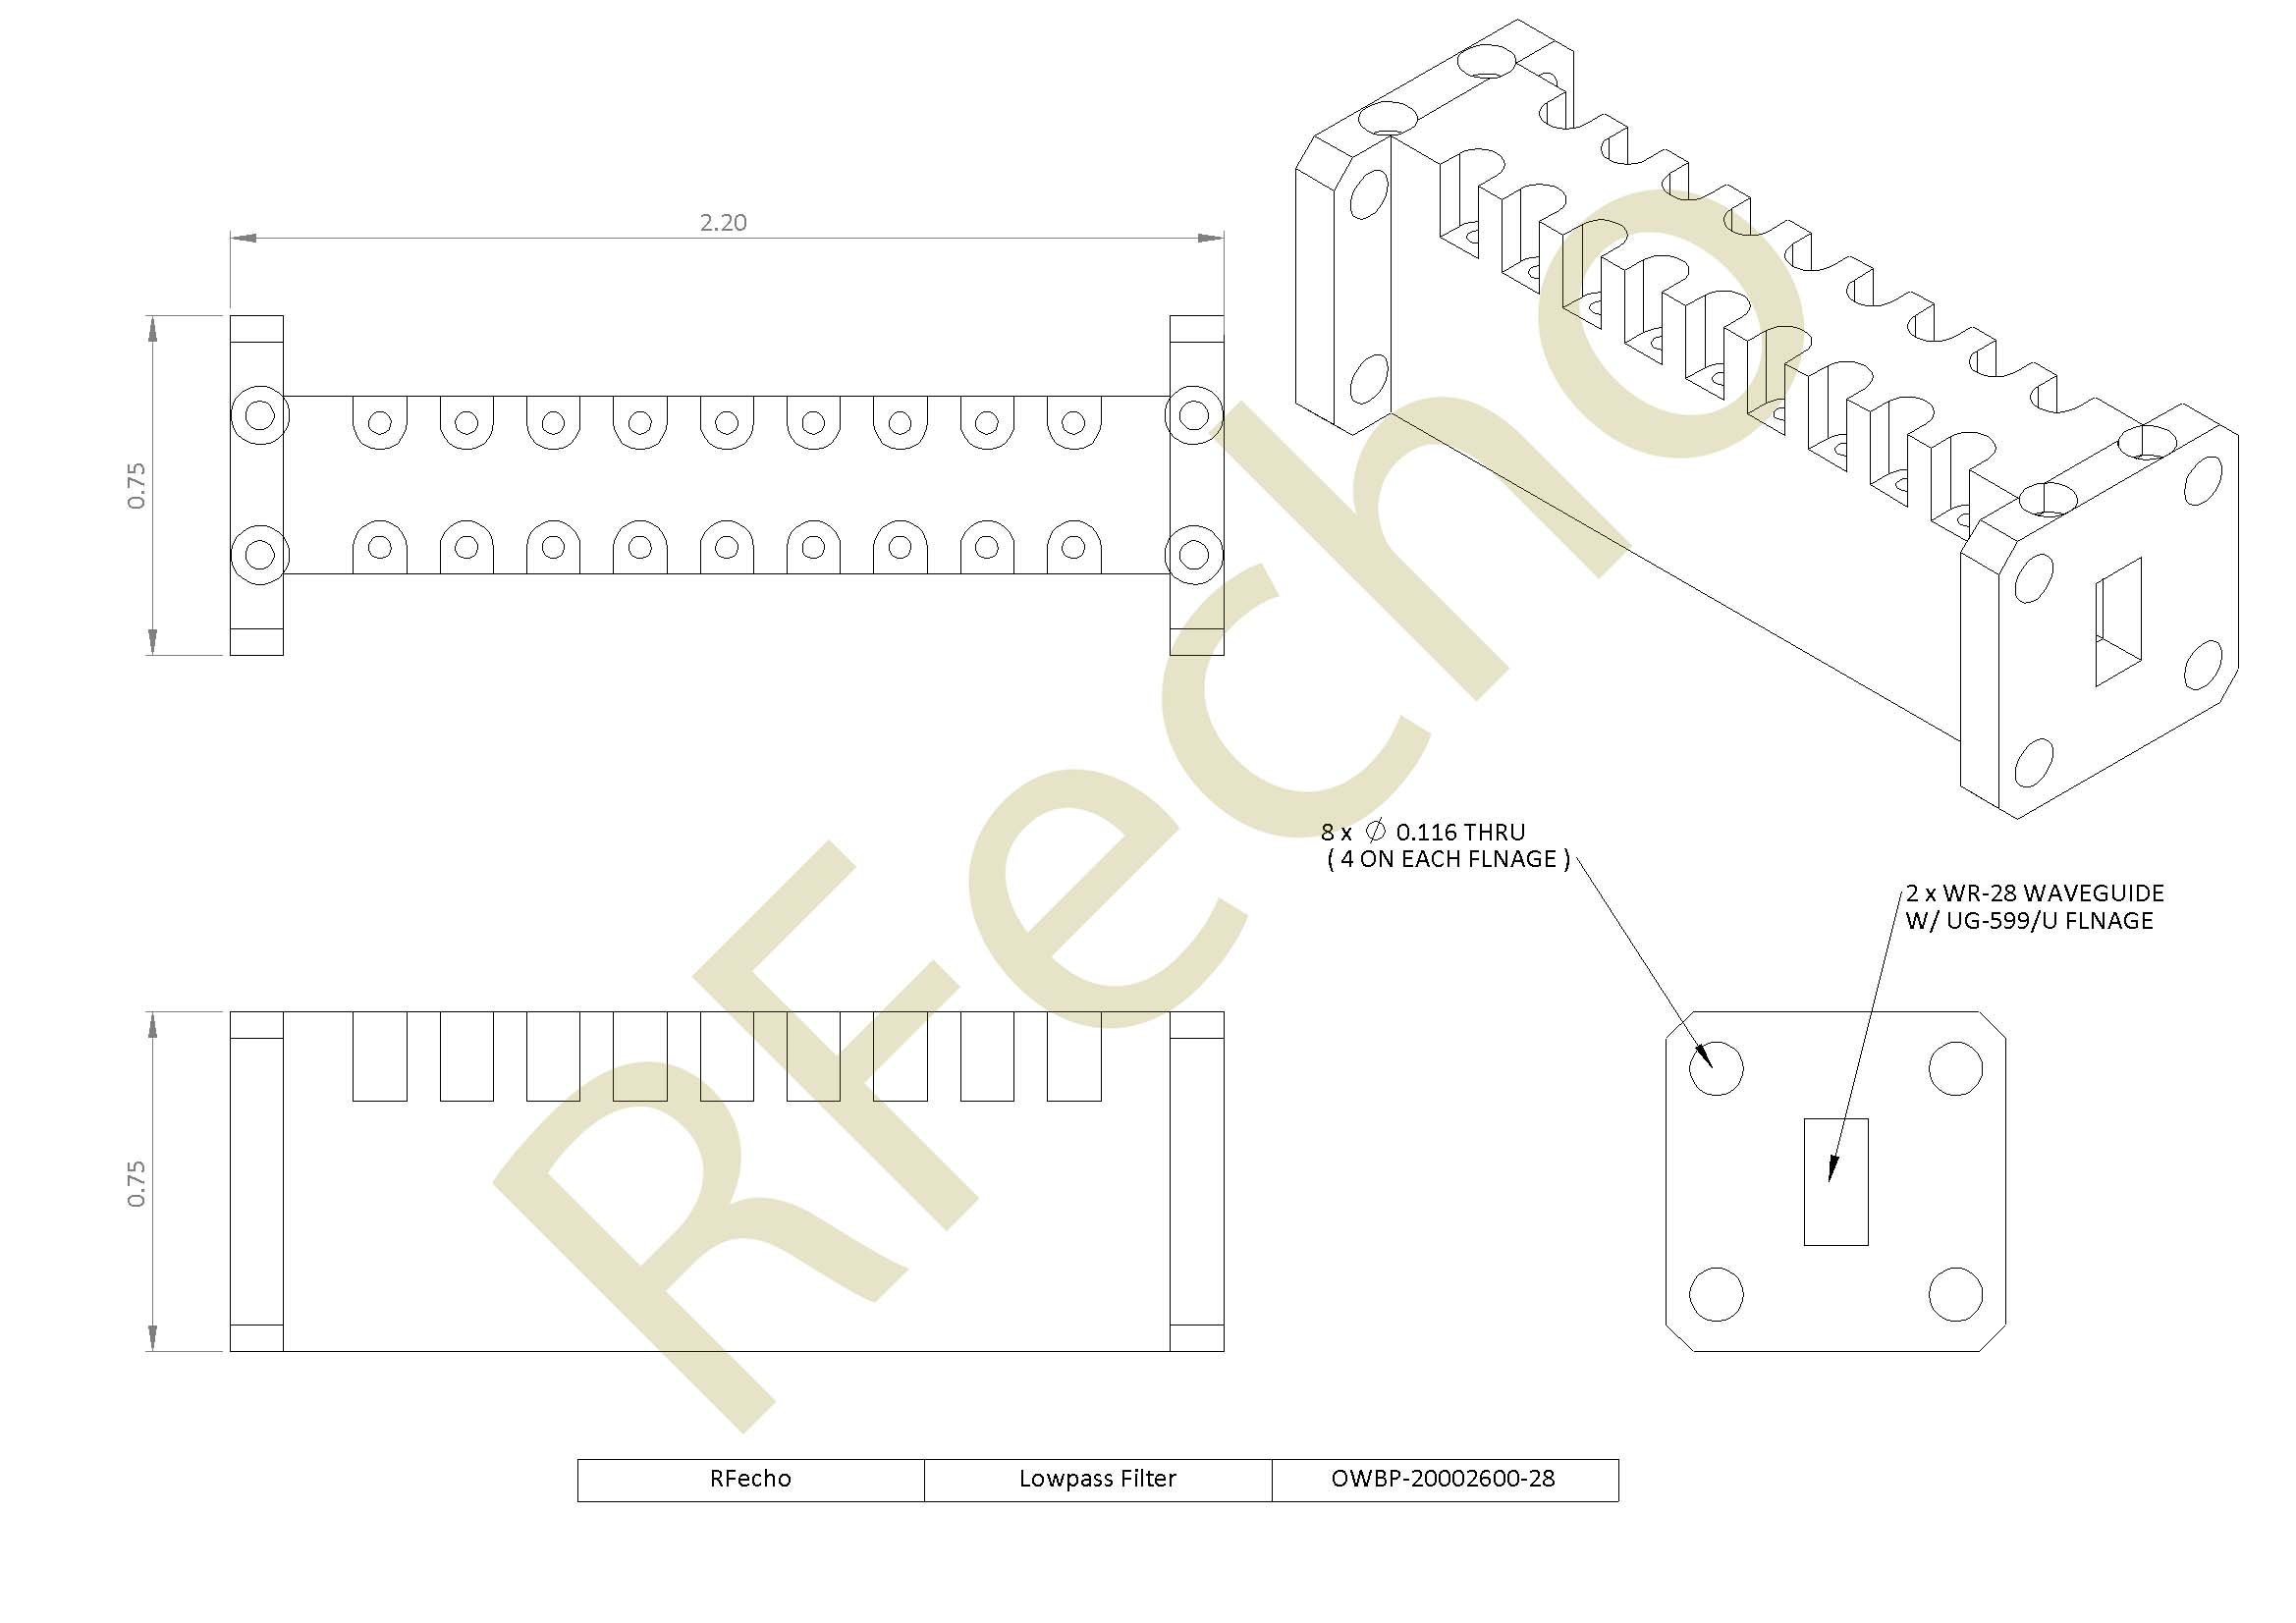 RF Filter Lowpass OWBP-20002600-28